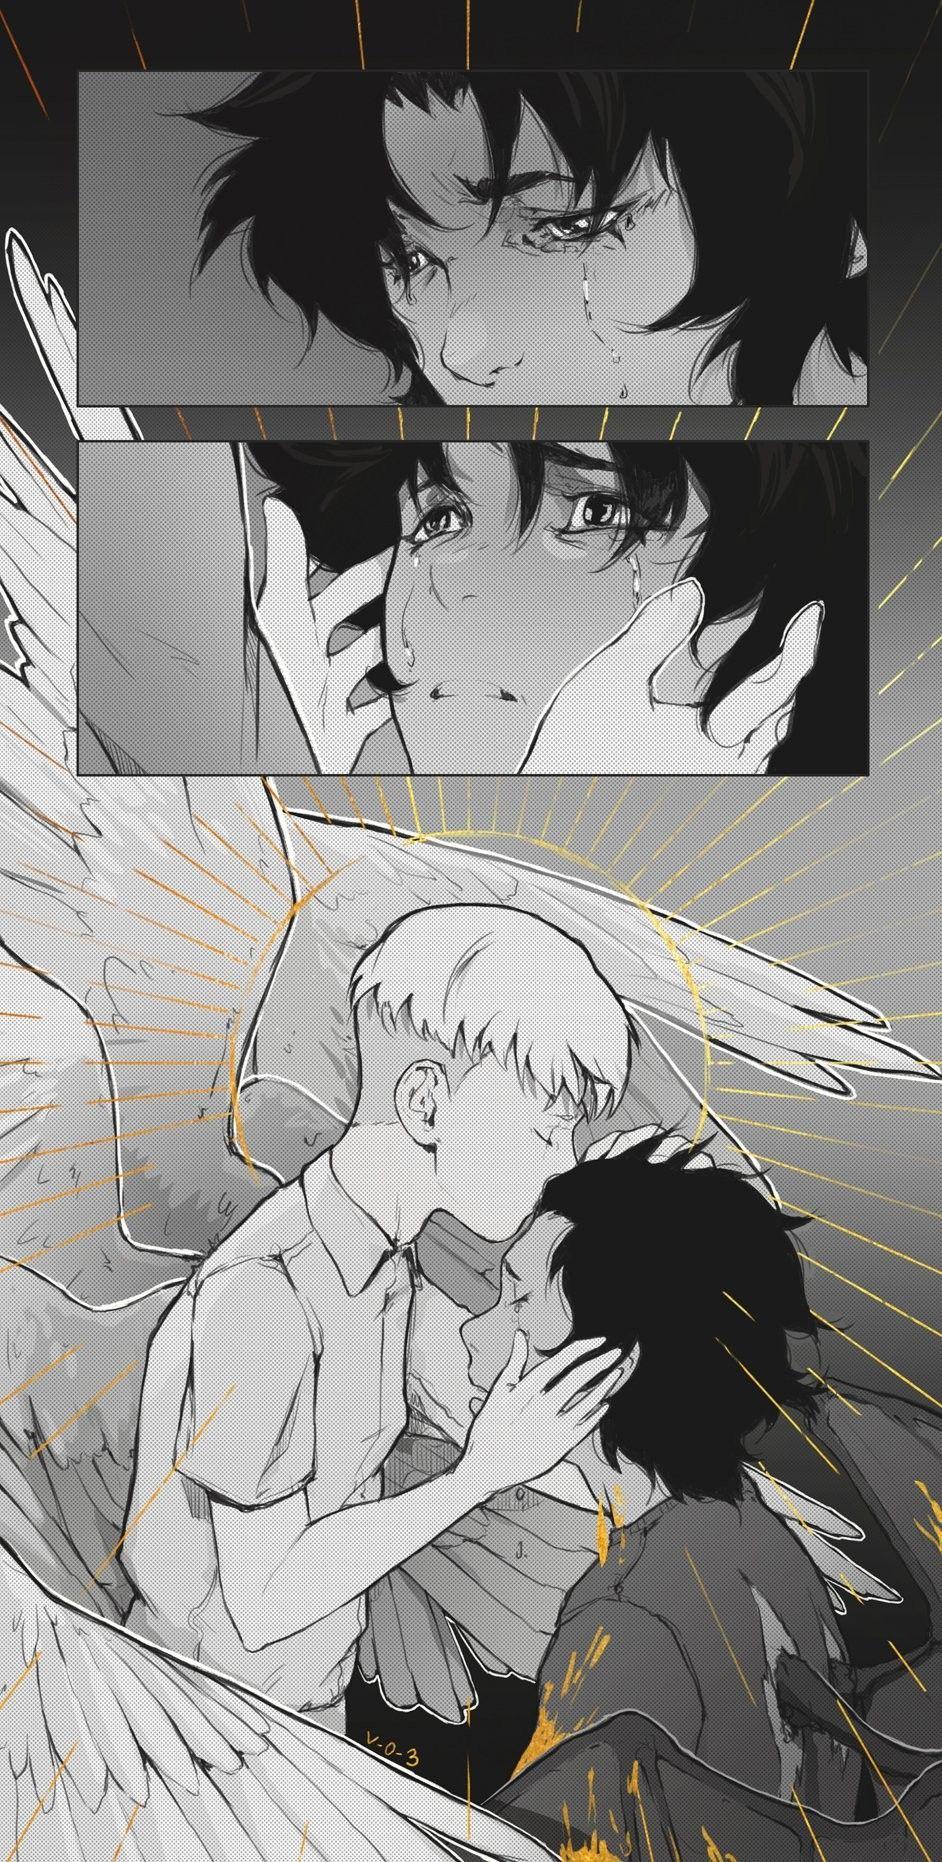 Ryo Asuka Satan Akira Fudo Devilman Devilman Crybaby Anime Cry Baby